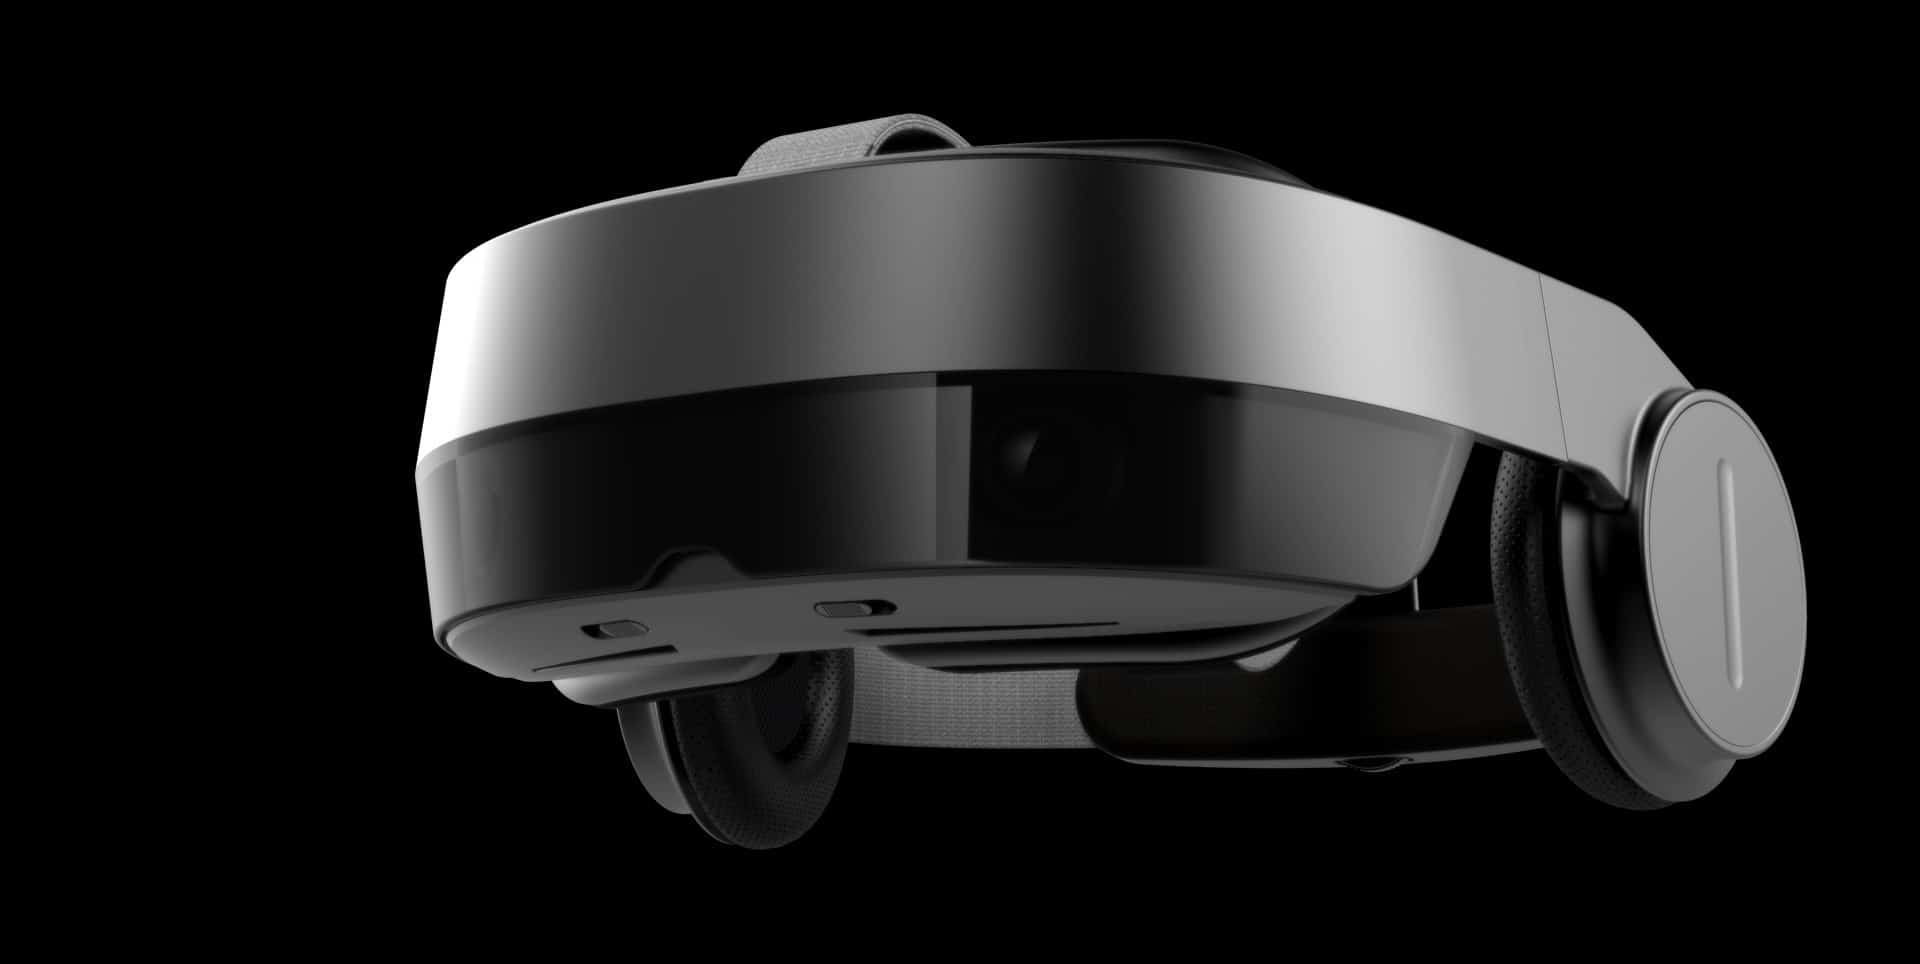 Virtual reality goggles design